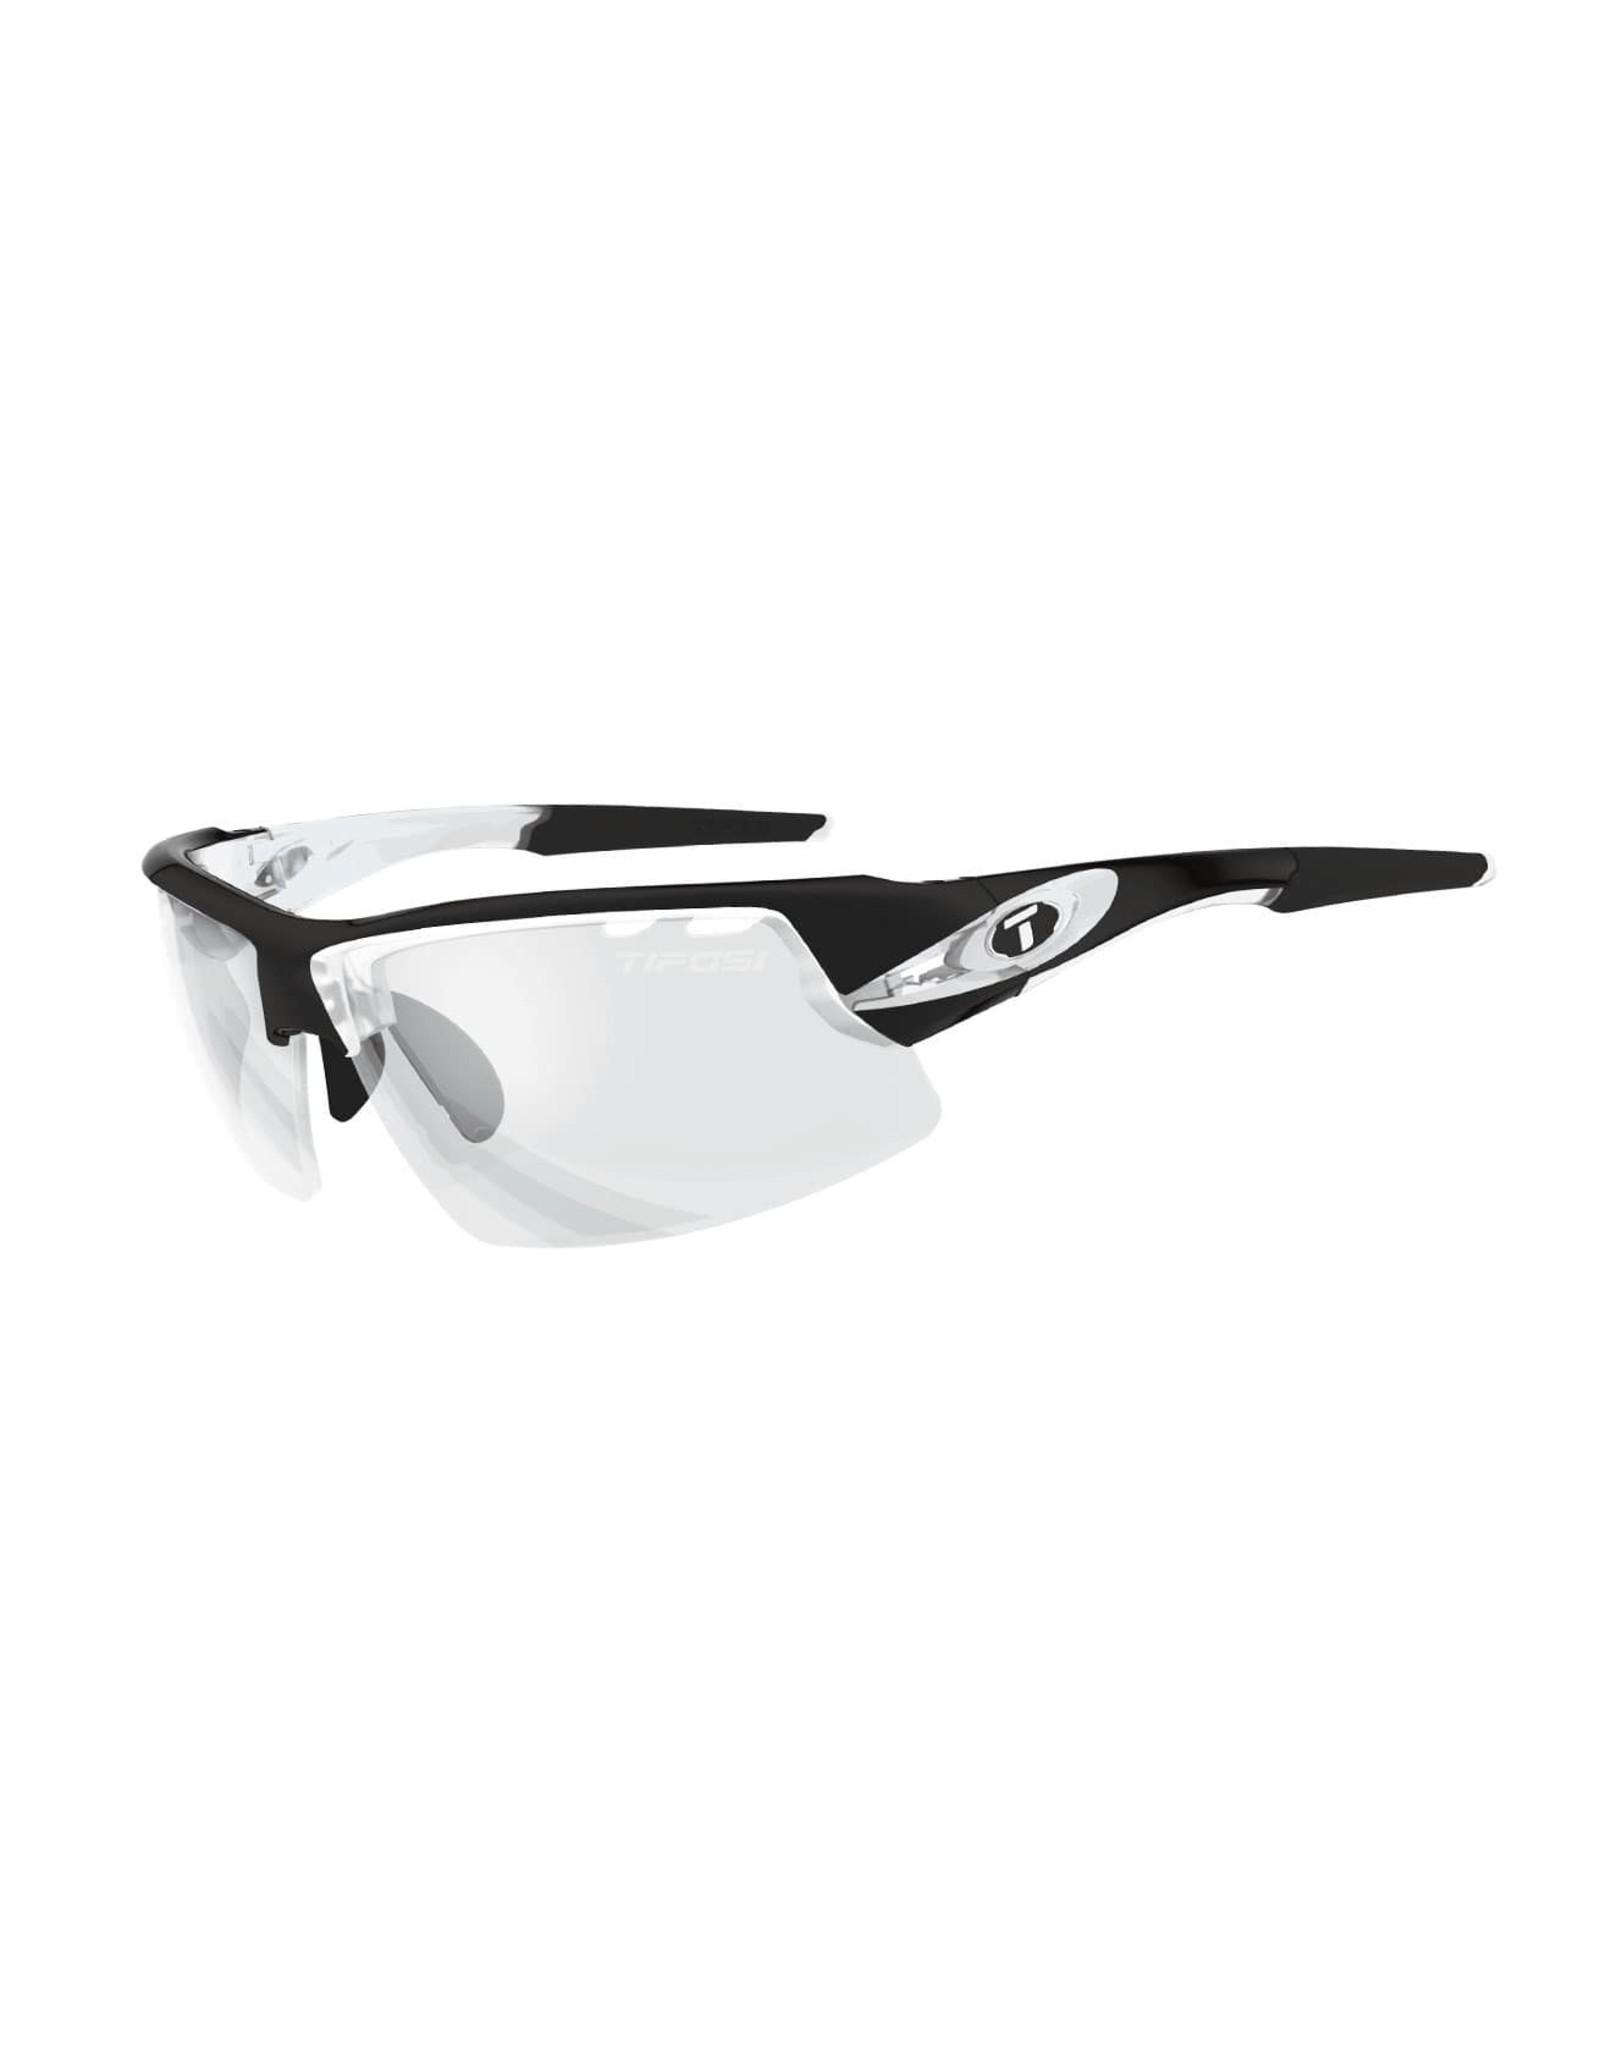 Tifosi Optics Crit, Crystal Black Enliven Bike Glasses